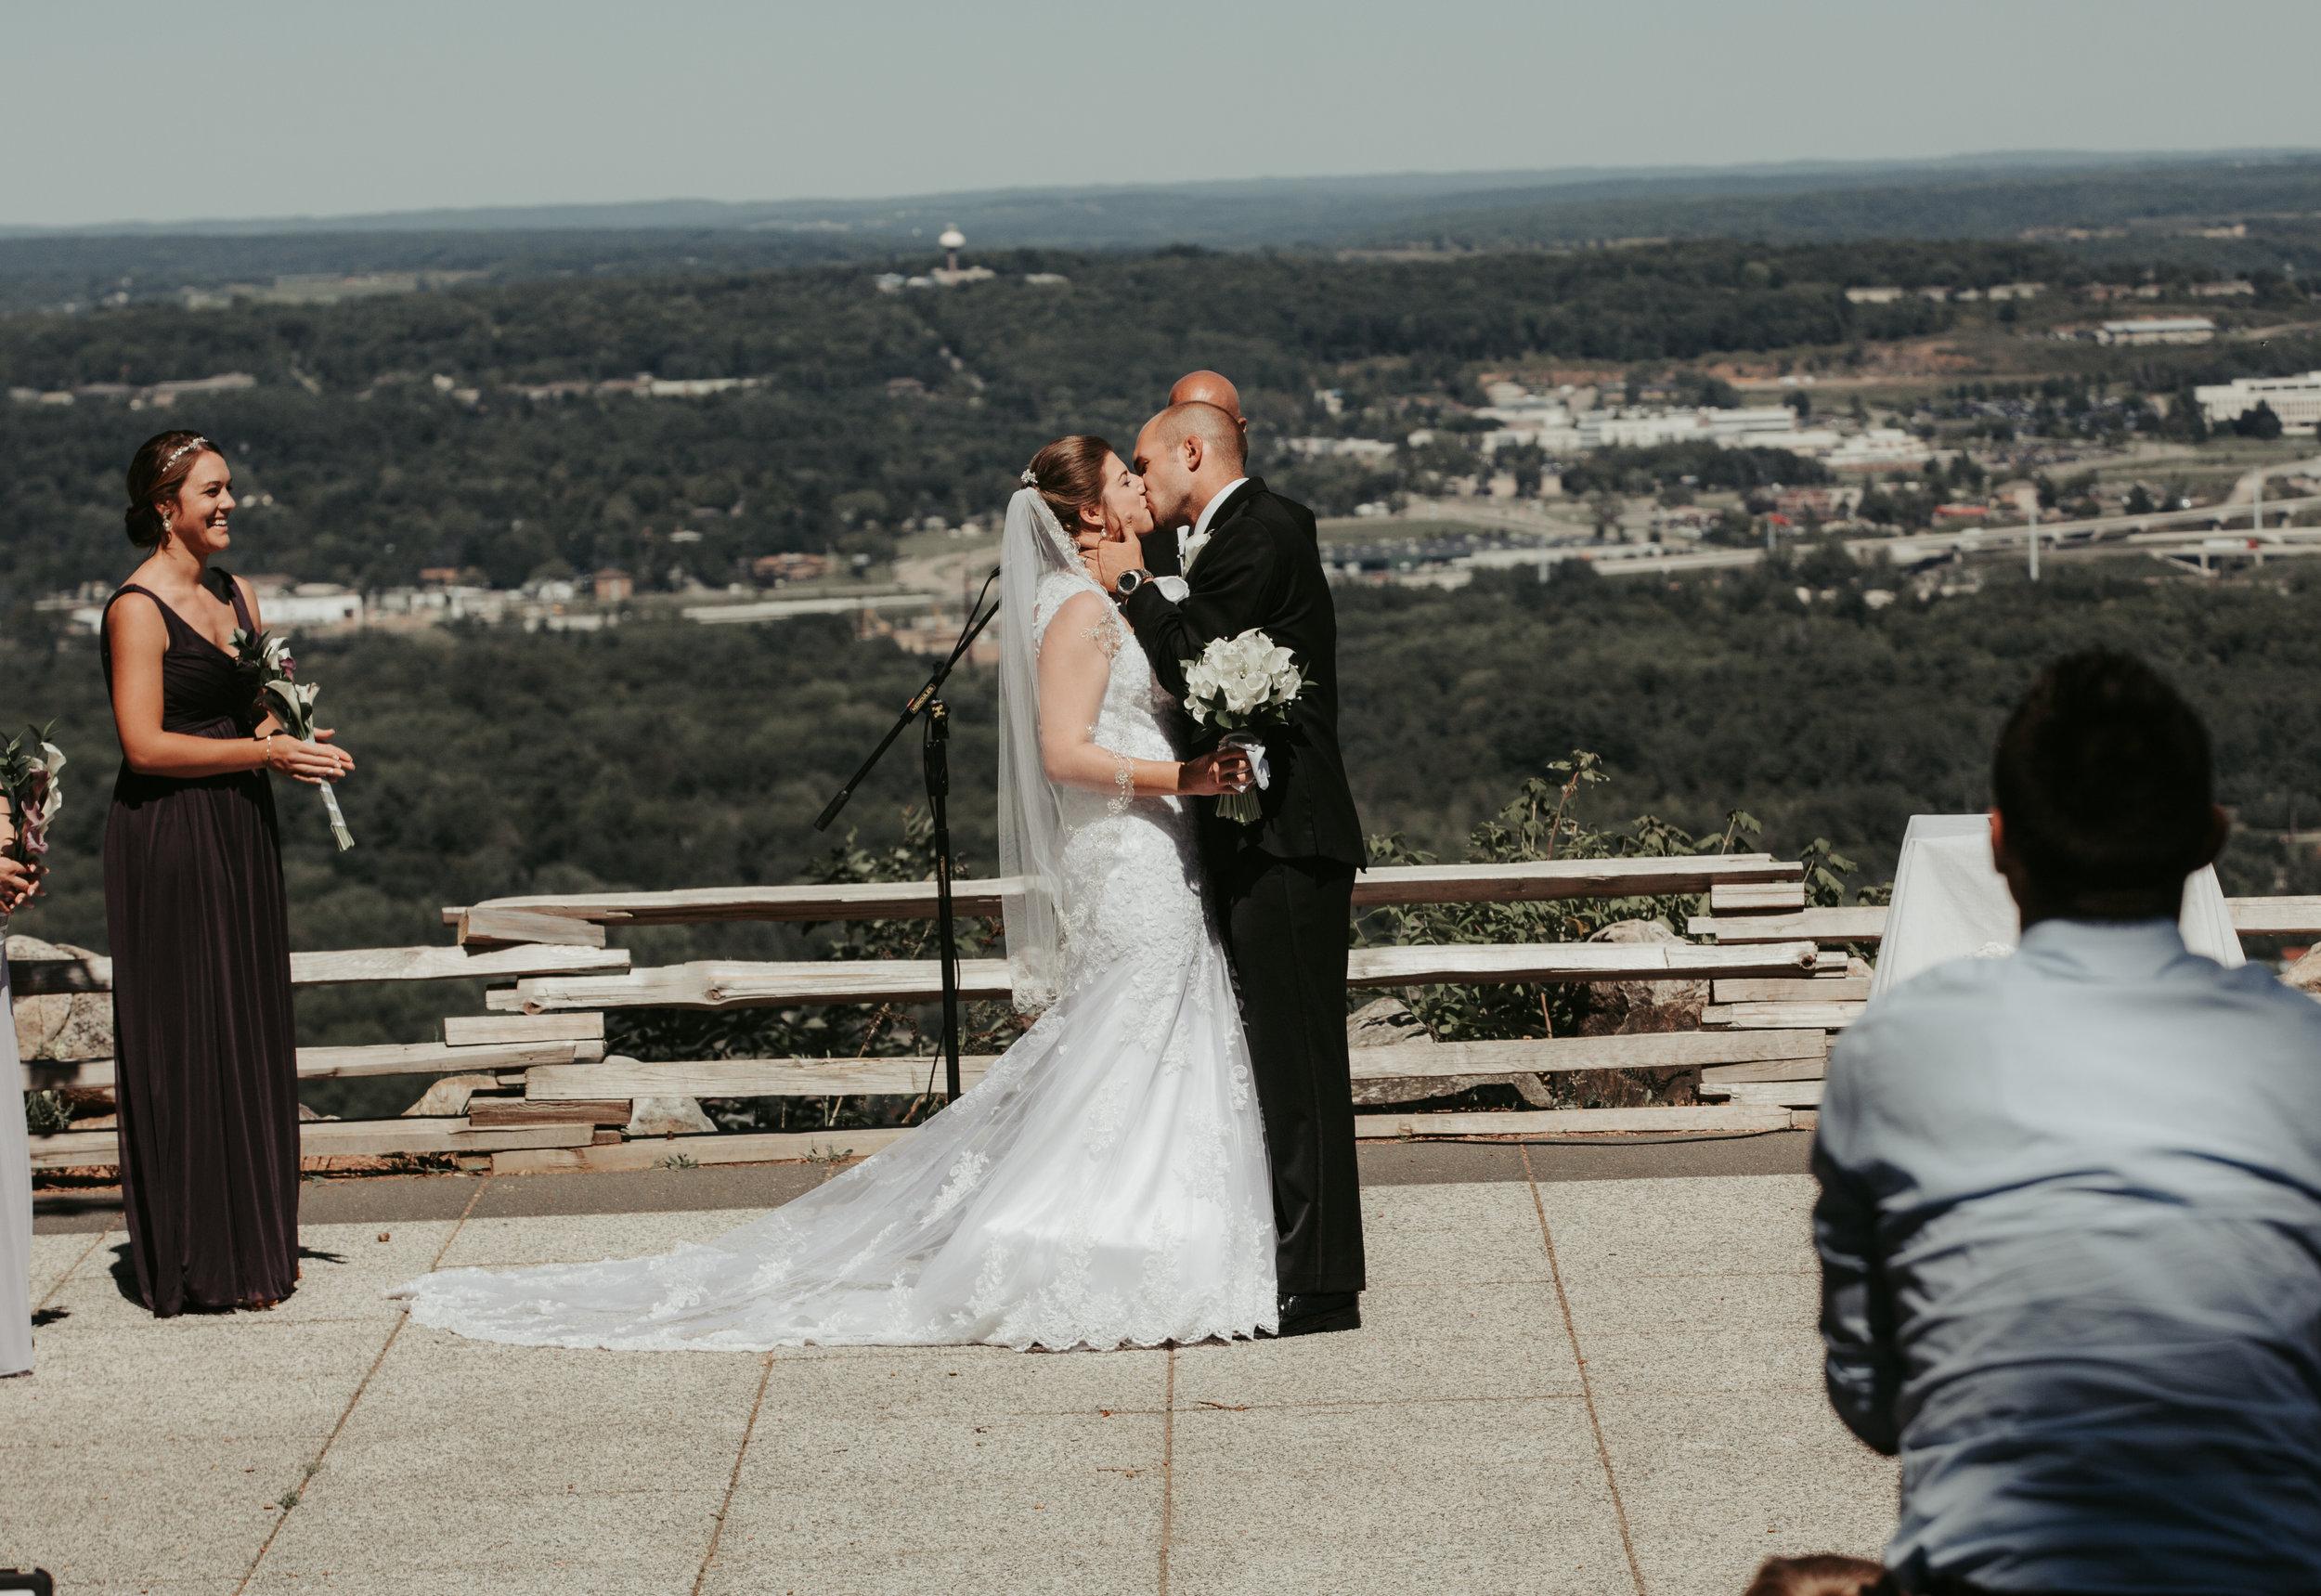 Rib Mountain State Park Wedding: Wausau, WI